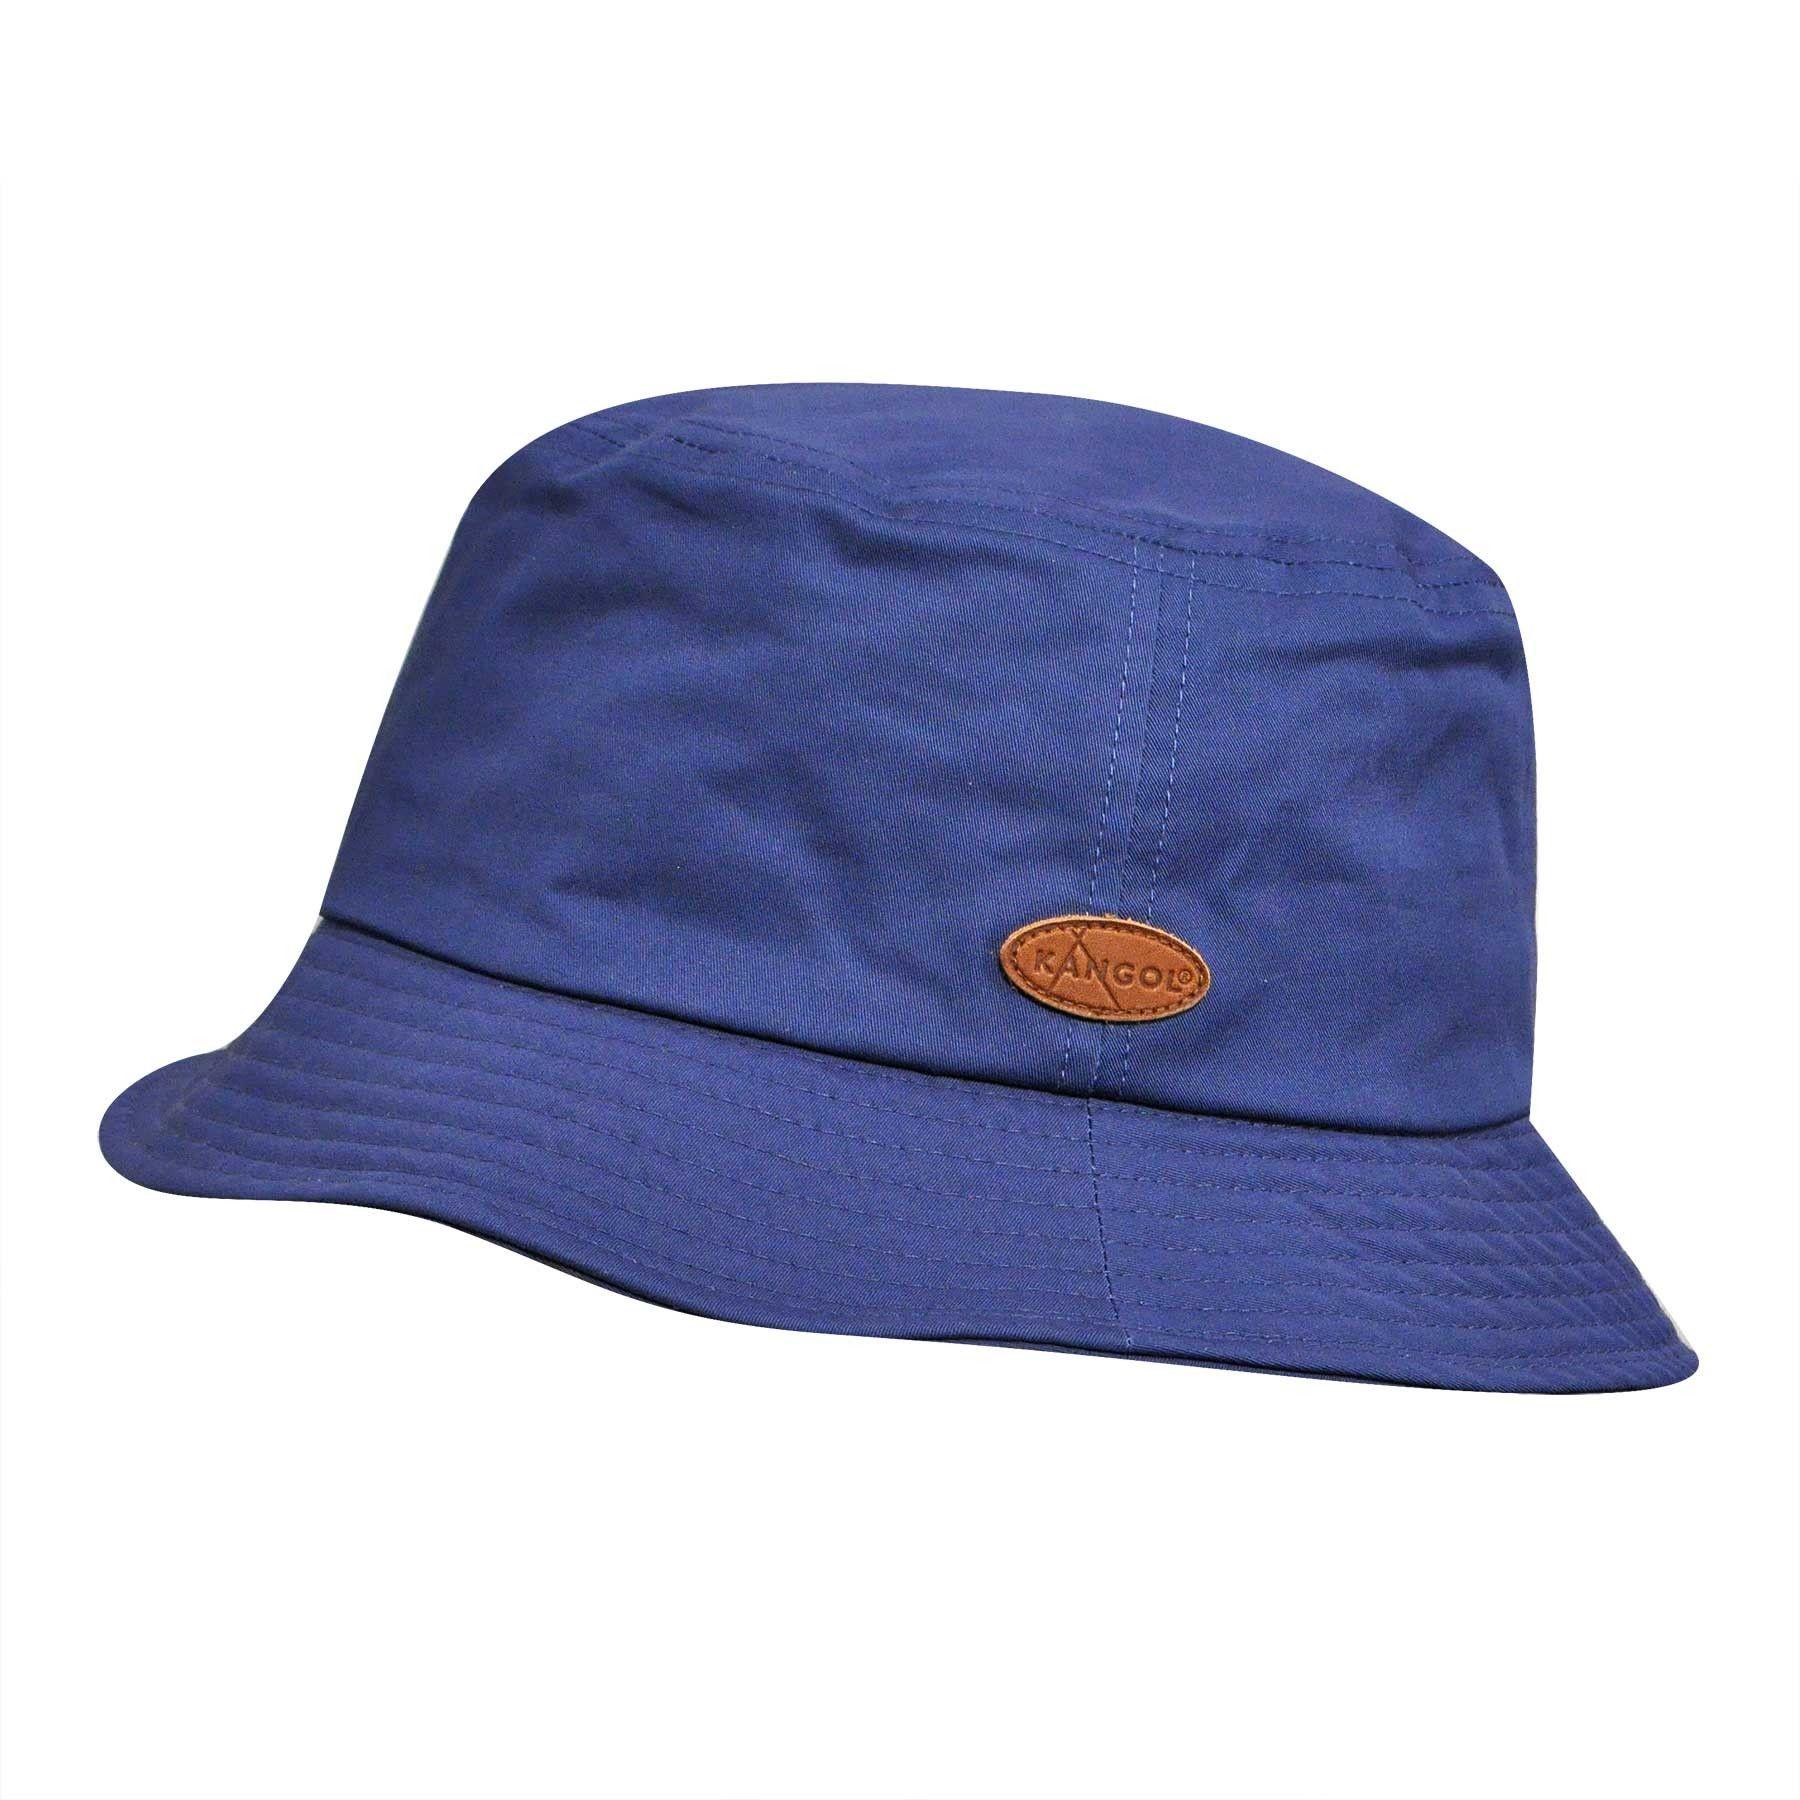 bd213ce2 Kangol Mens Bucket Hats Uk